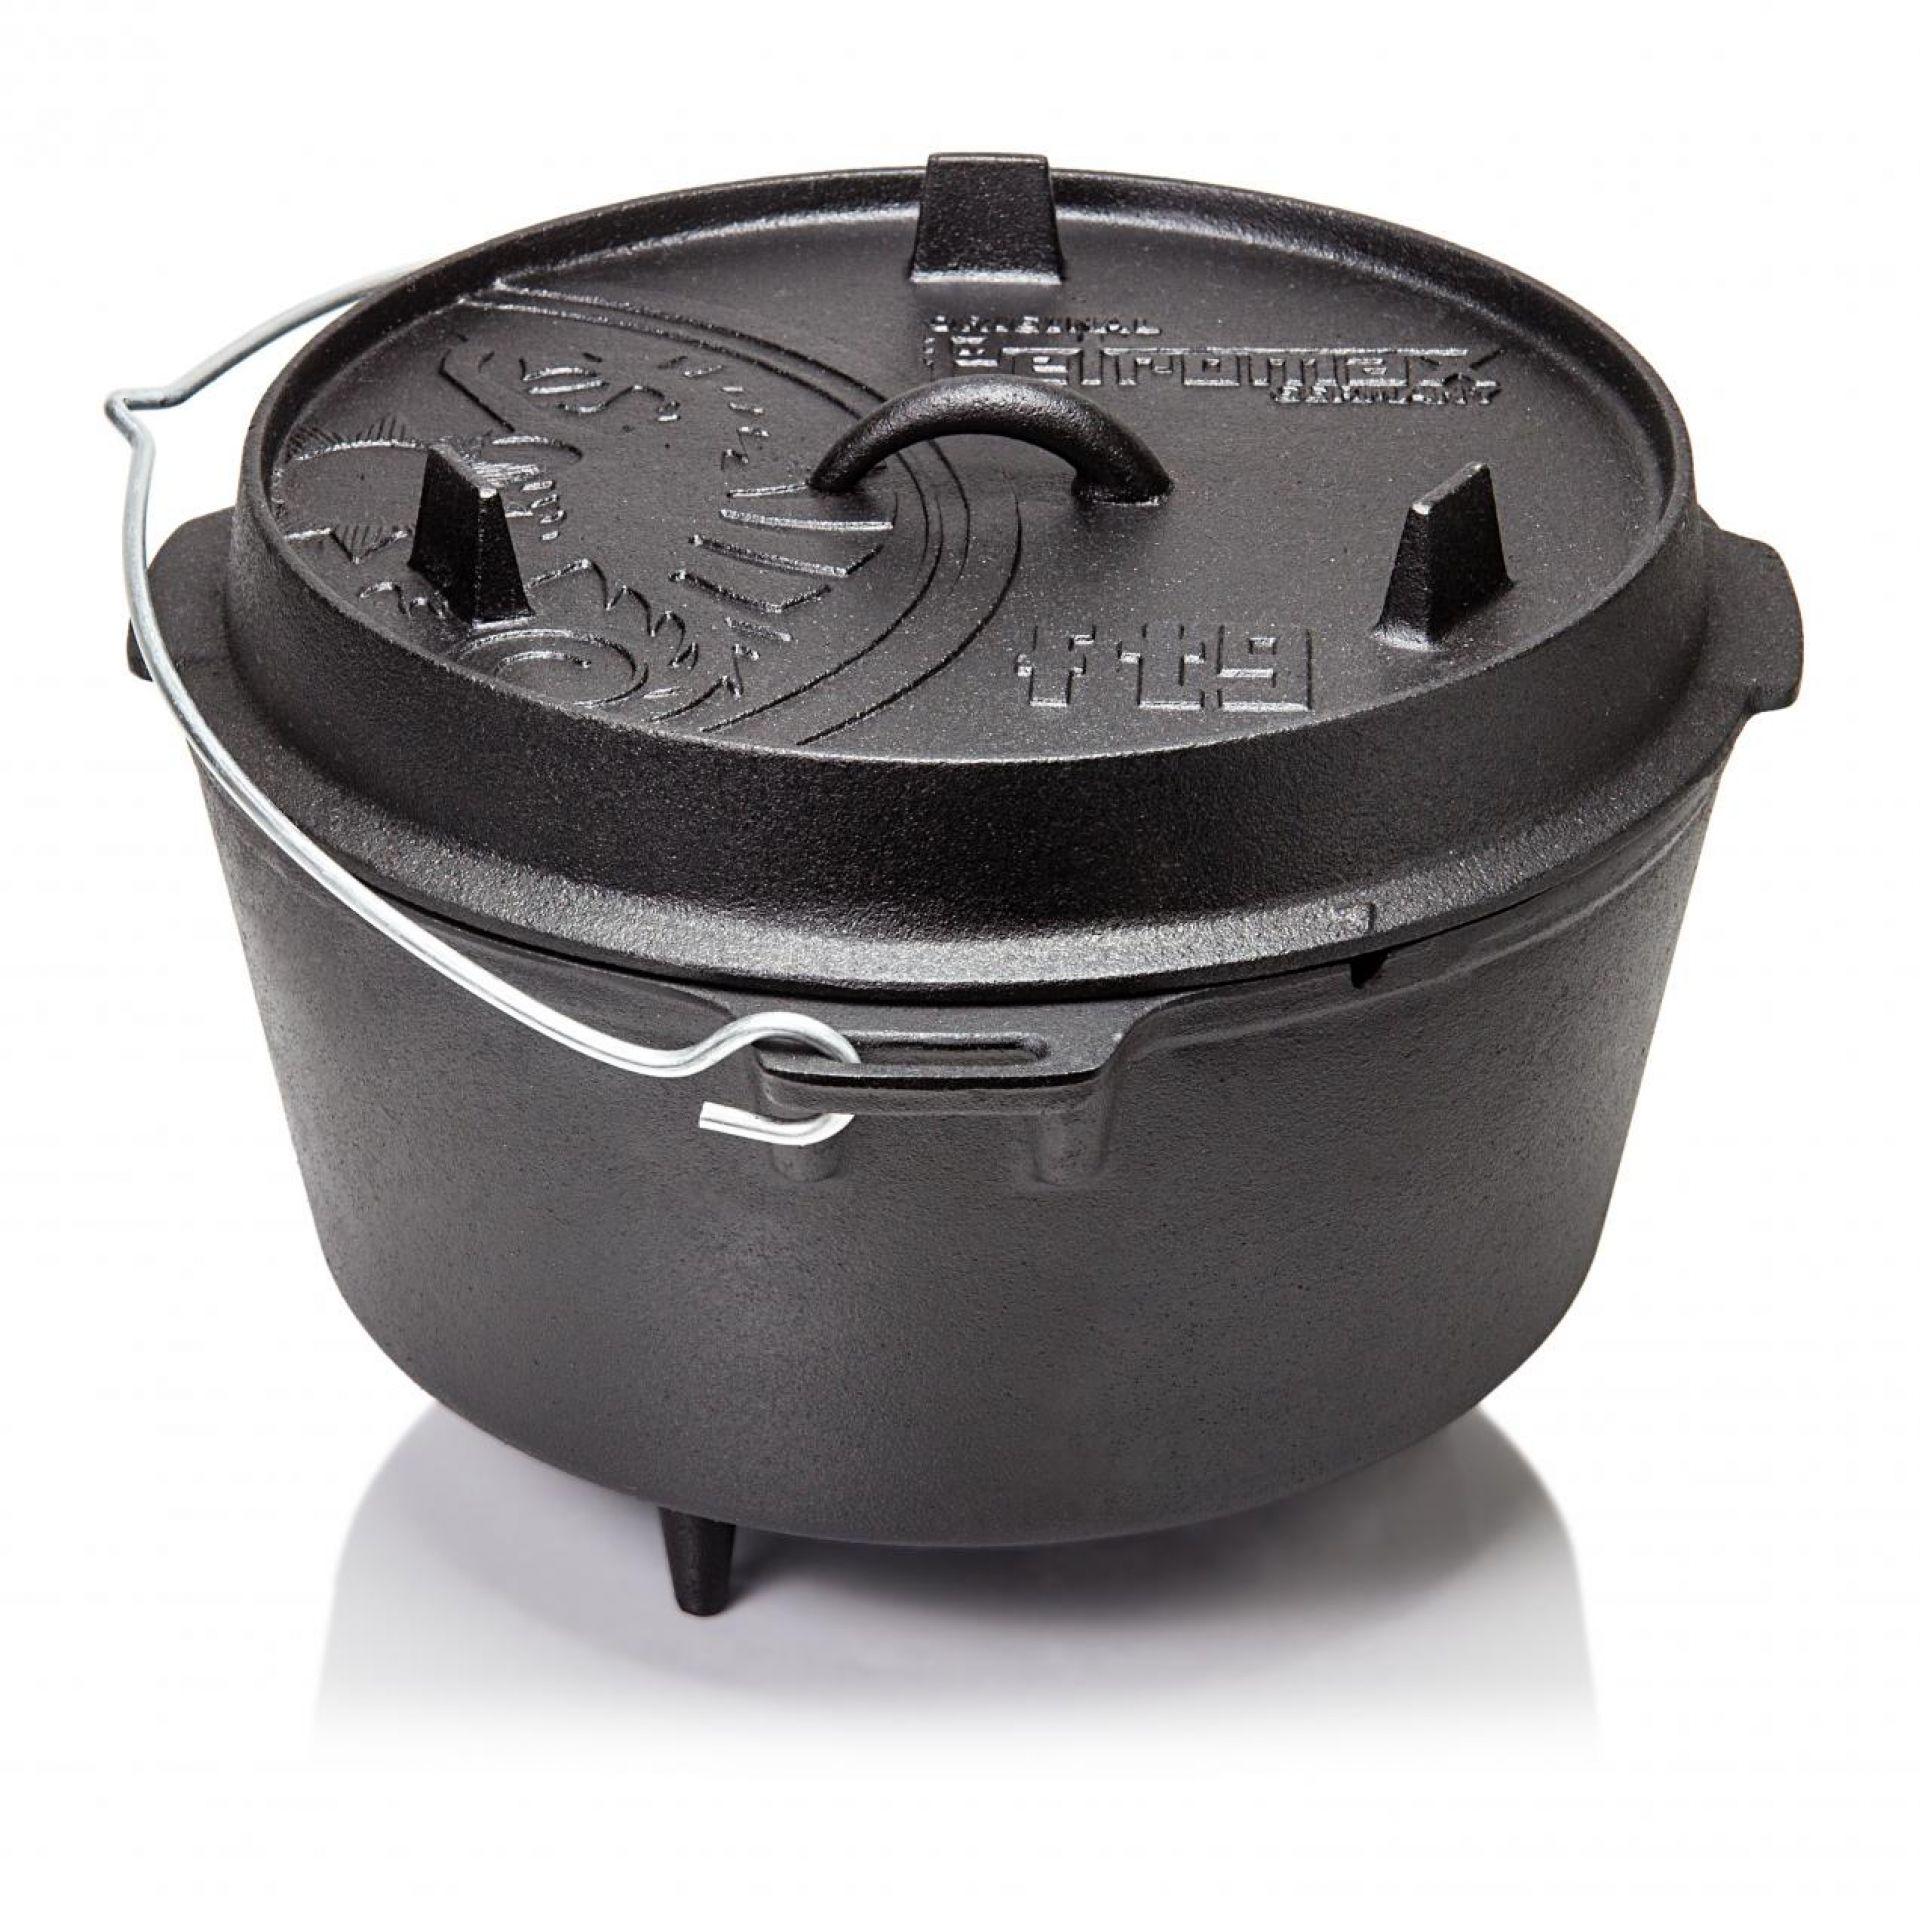 Petromax Dutch Oven ft9